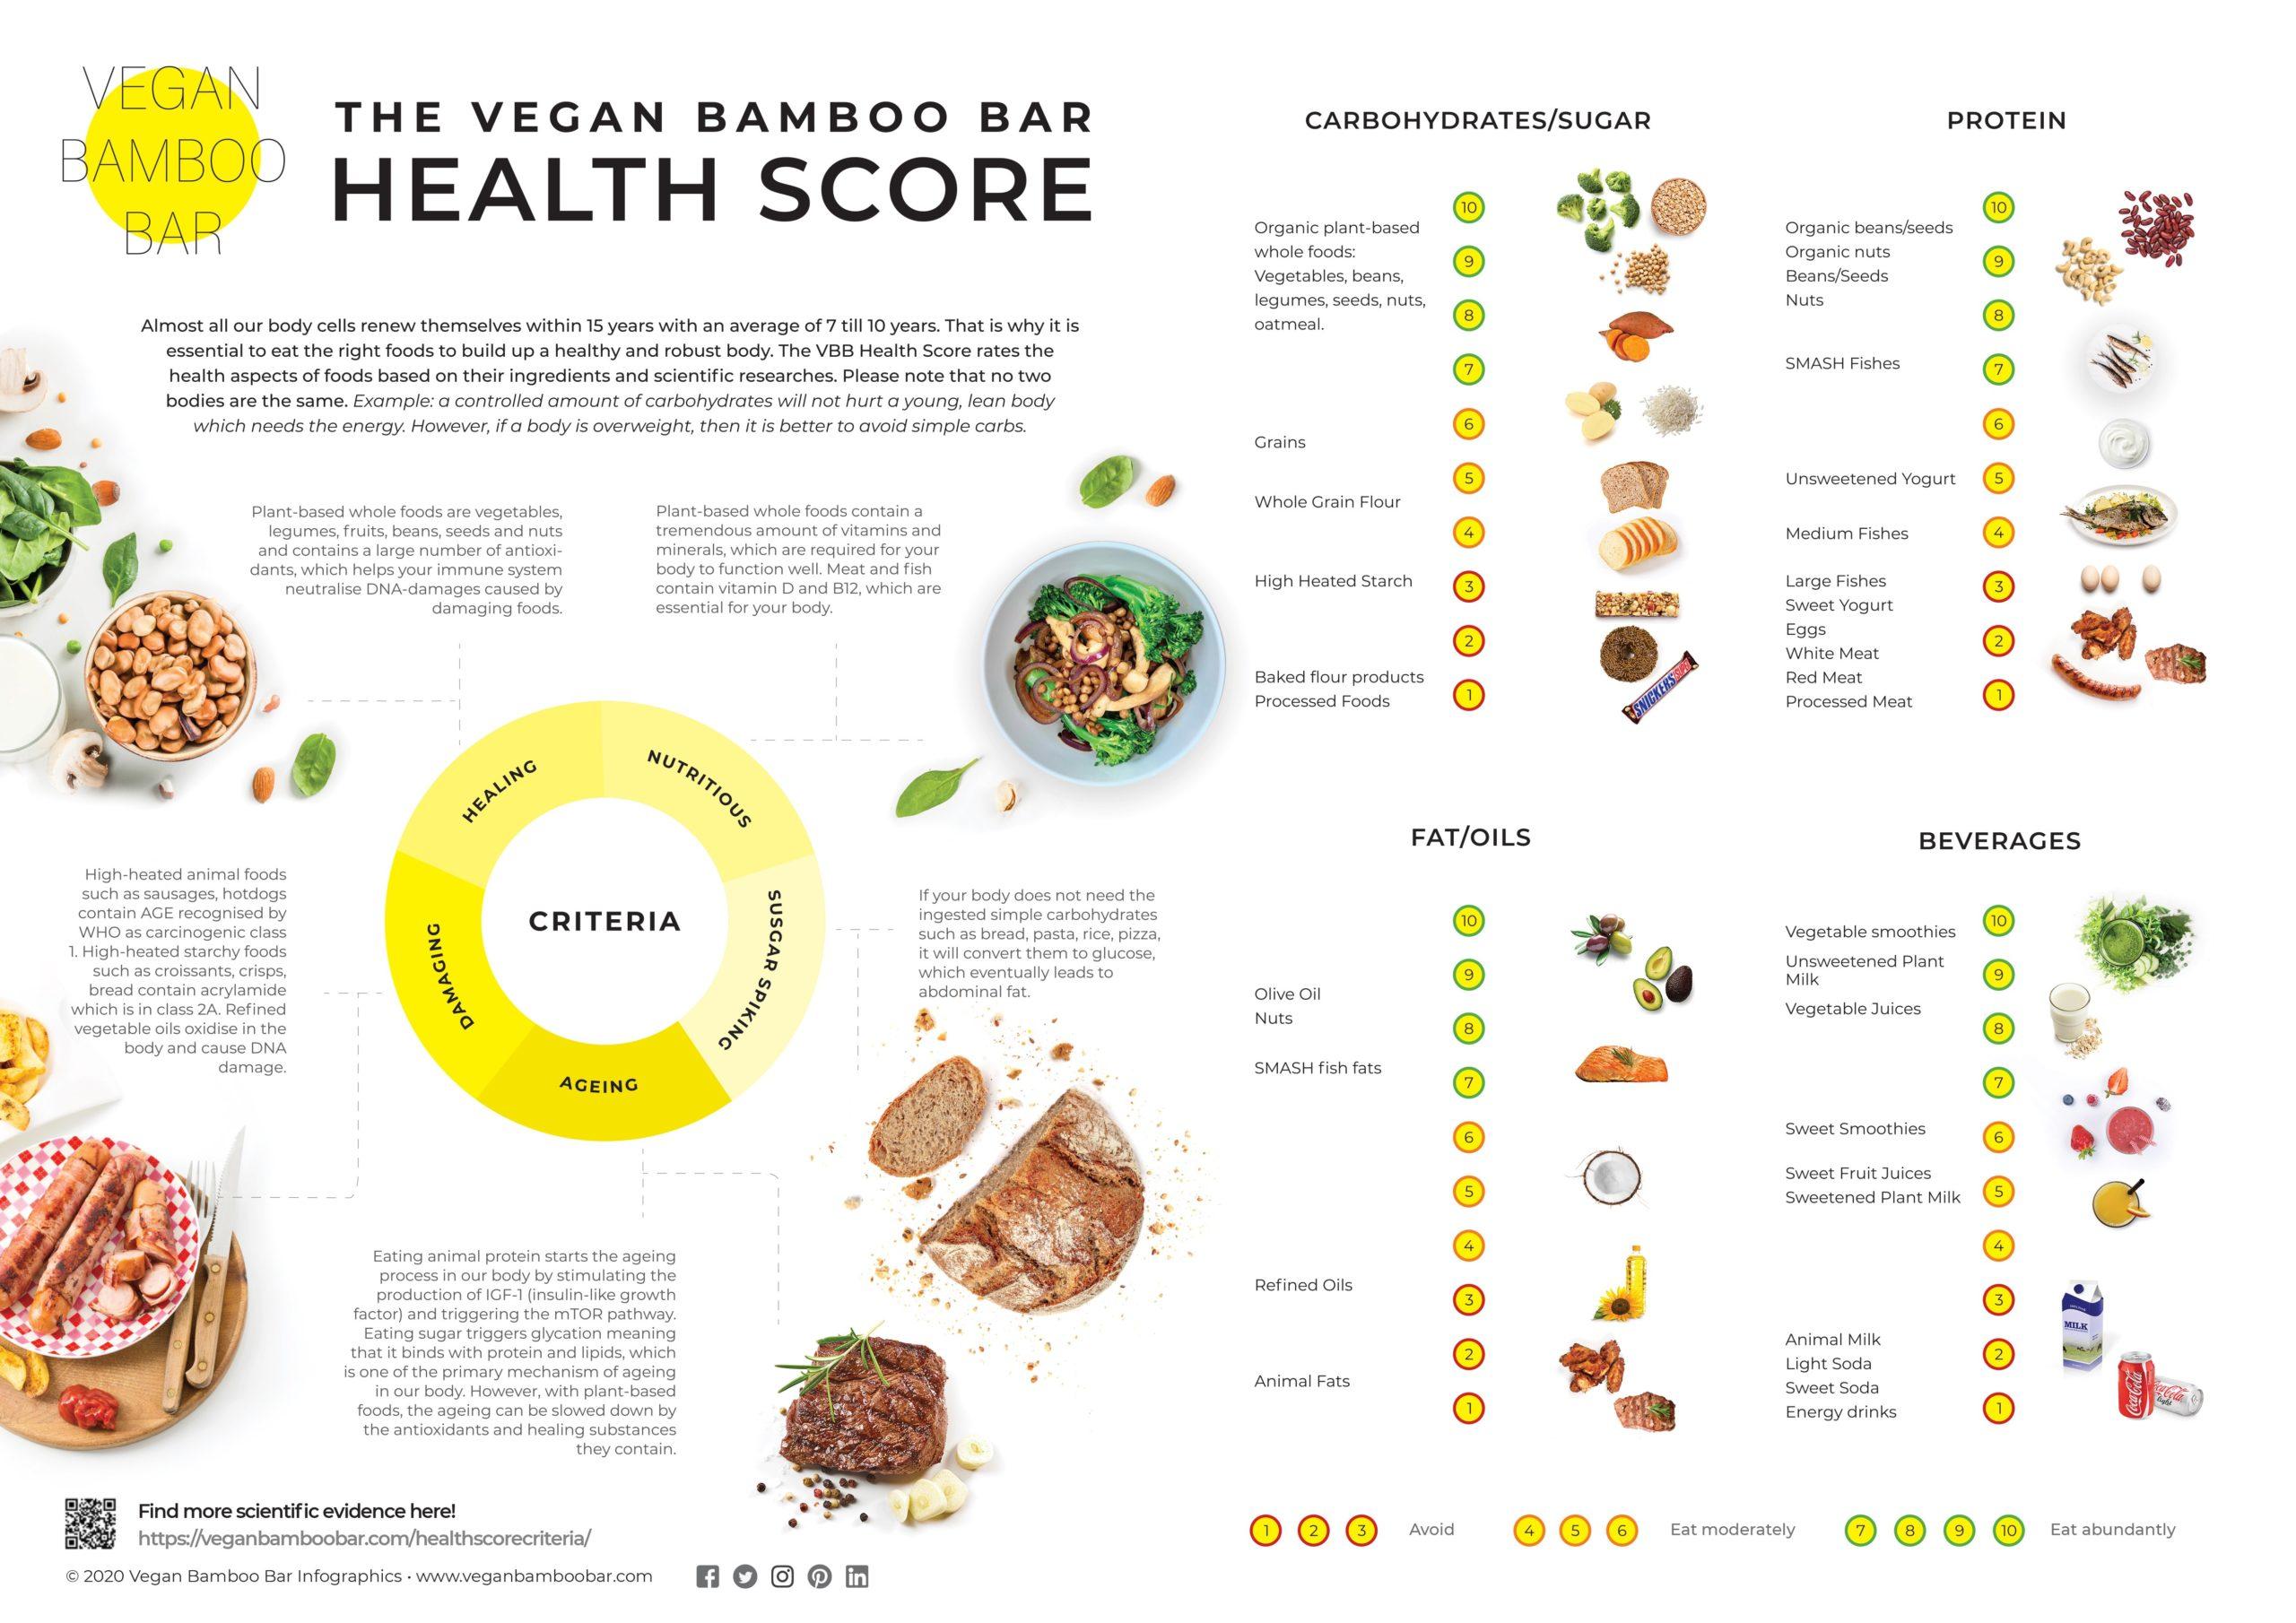 Vegan Bamboo Bar Healthscore